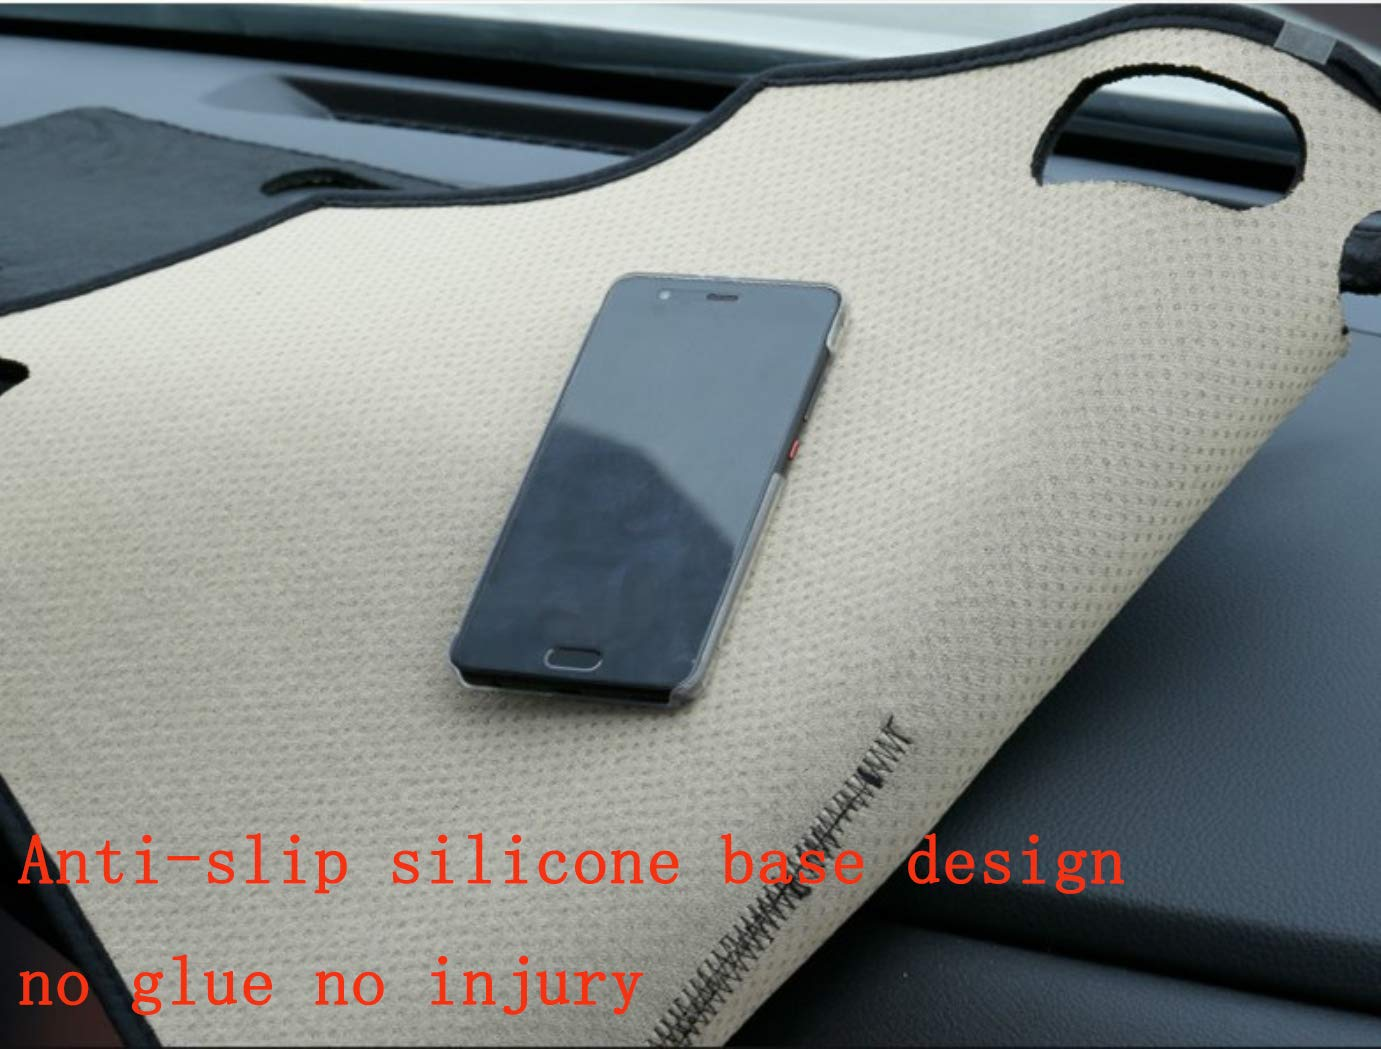 Oneuda Flannel Dashmat Dashboard Cover Dash Pad Car Mat Carpet Sun Shade for Hyundai Accent Verna 2012 2013 2014 2015 2016 2017 Solaris/ Anti-Slip Dash Board Cover Auto Accessories